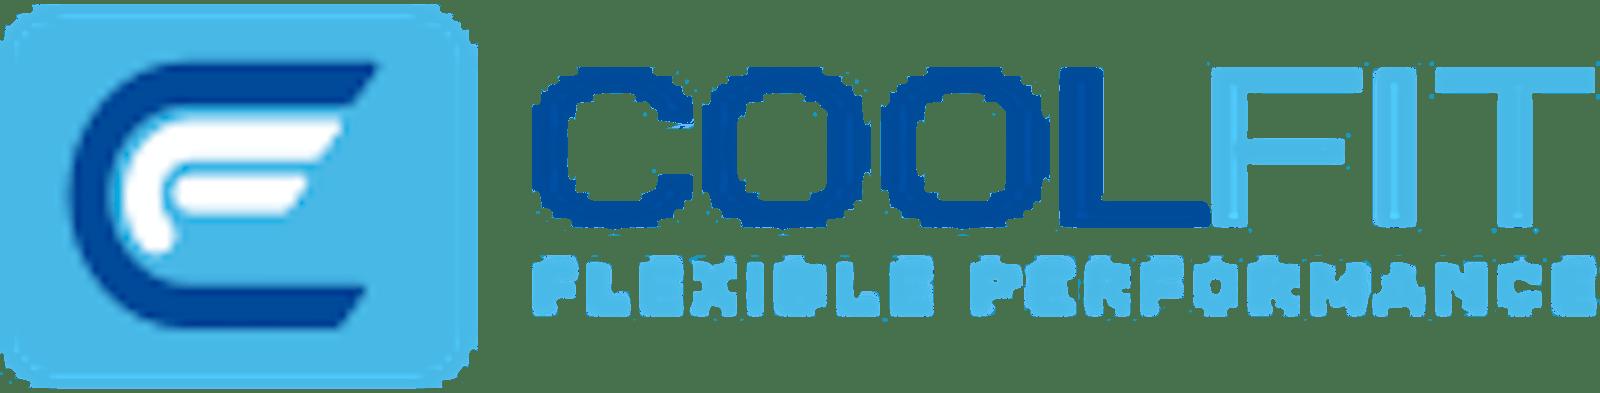 COOLFIT certification